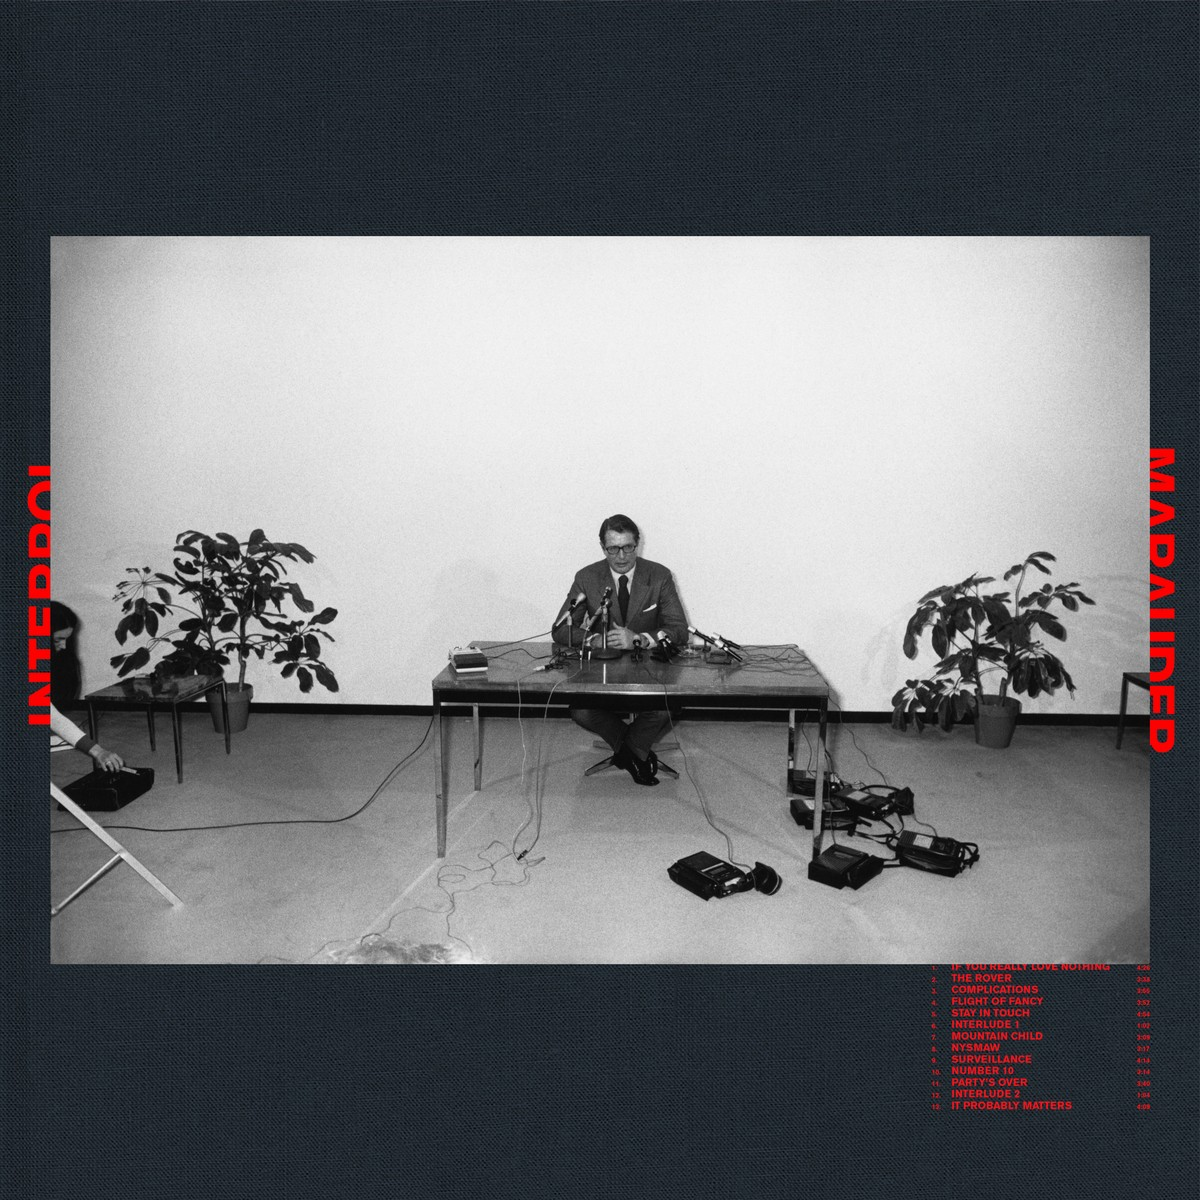 Interpol Marauder album cover